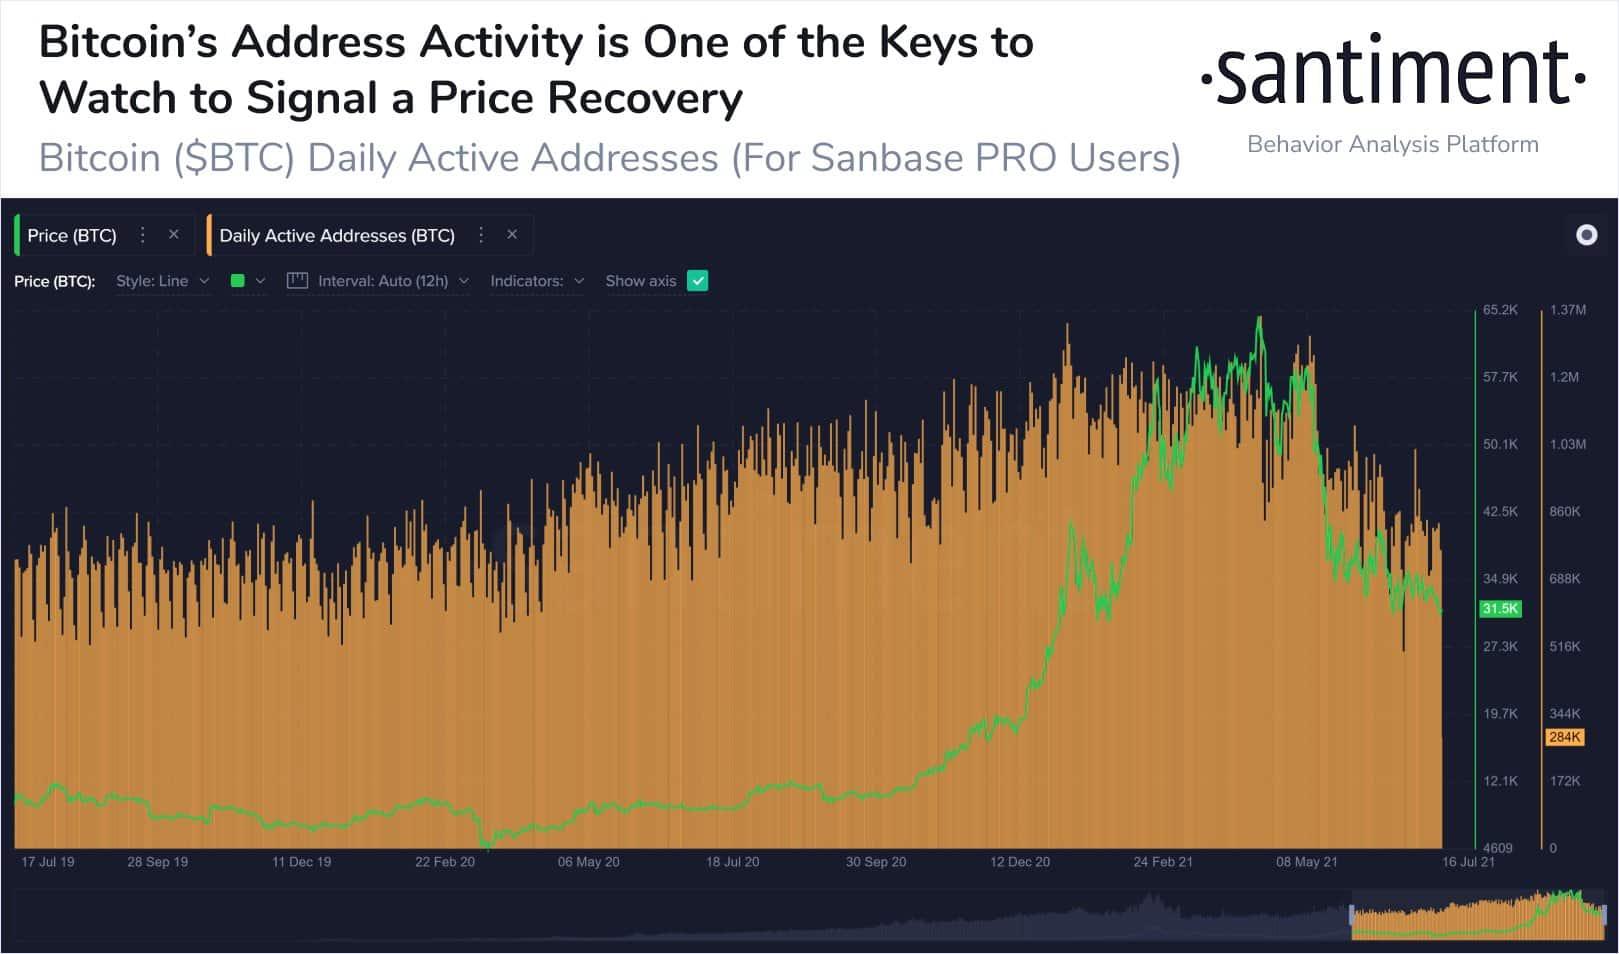 Bitcoin BTC Address Activity